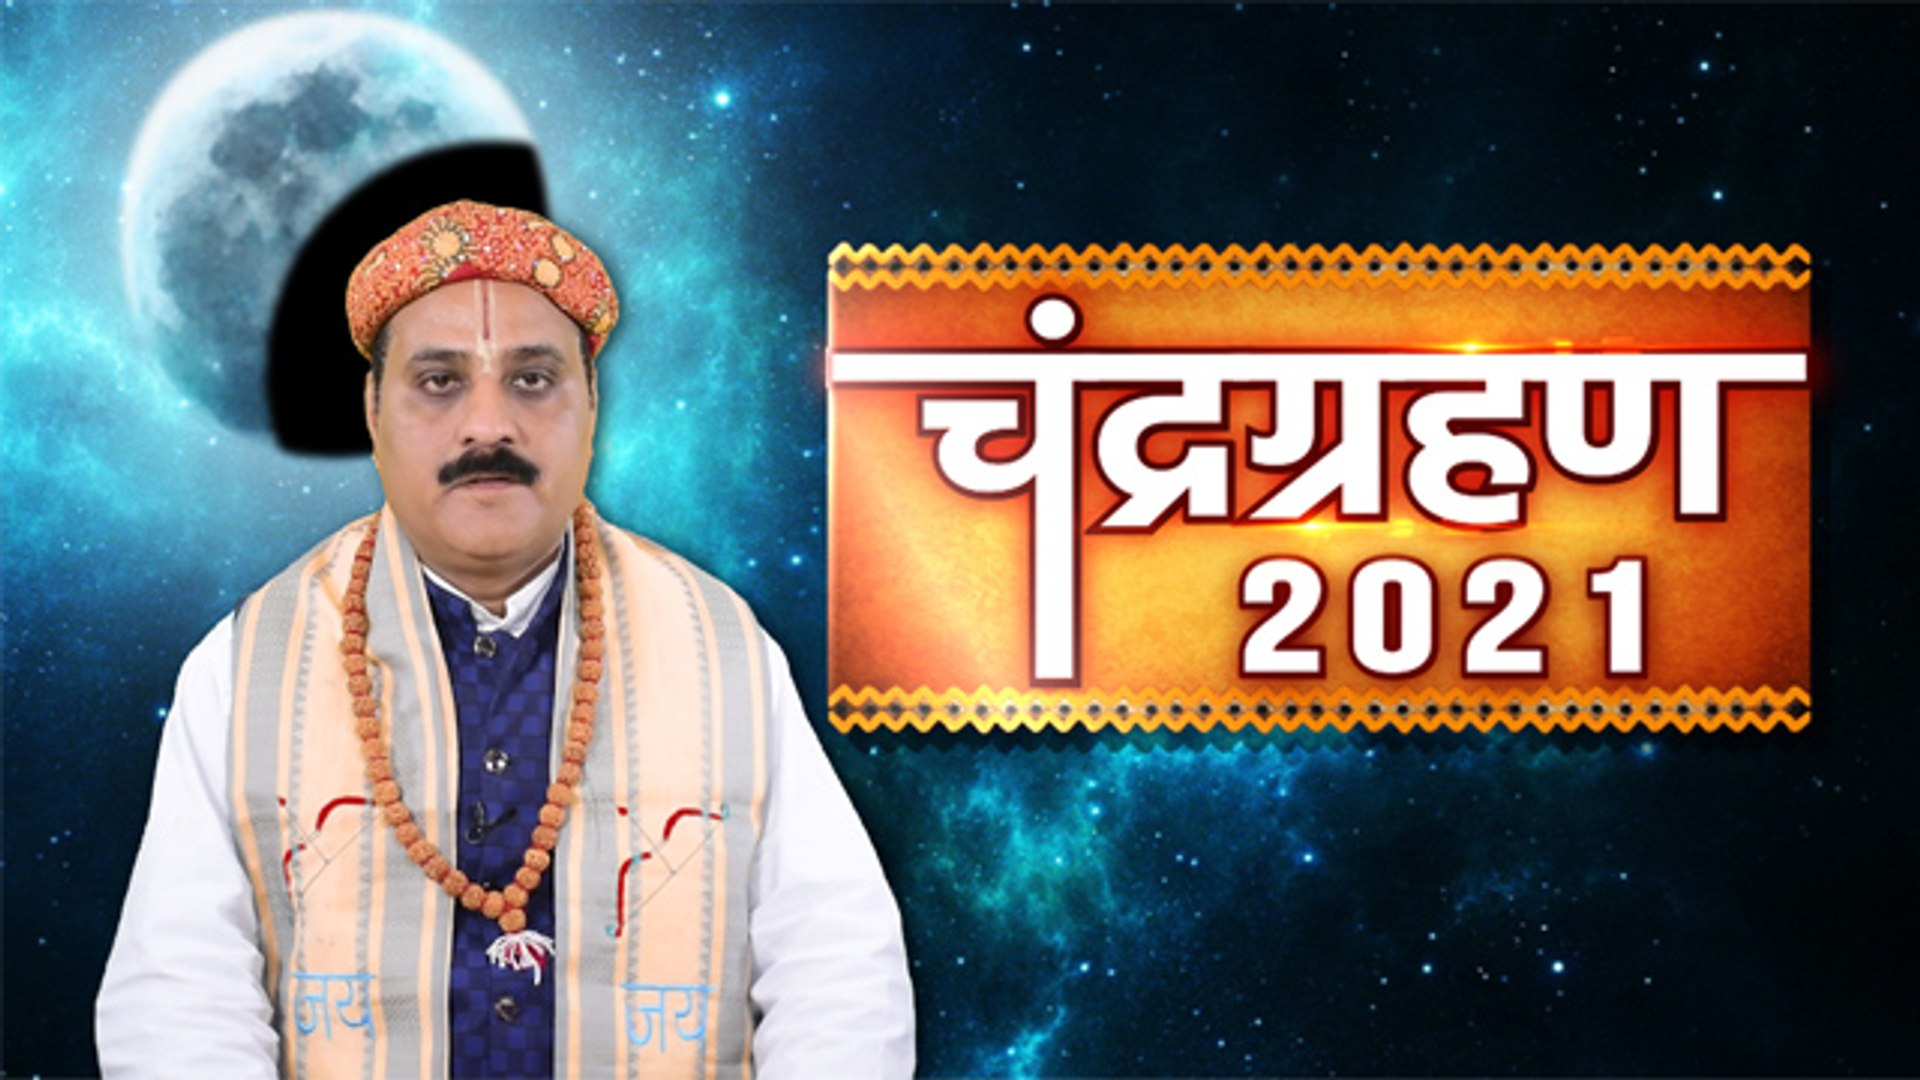 Chandra Grahan 2021: 2021 का चंद्रग्रहण | Grahan 2021 Dates and Times In Hindi | Boldsky